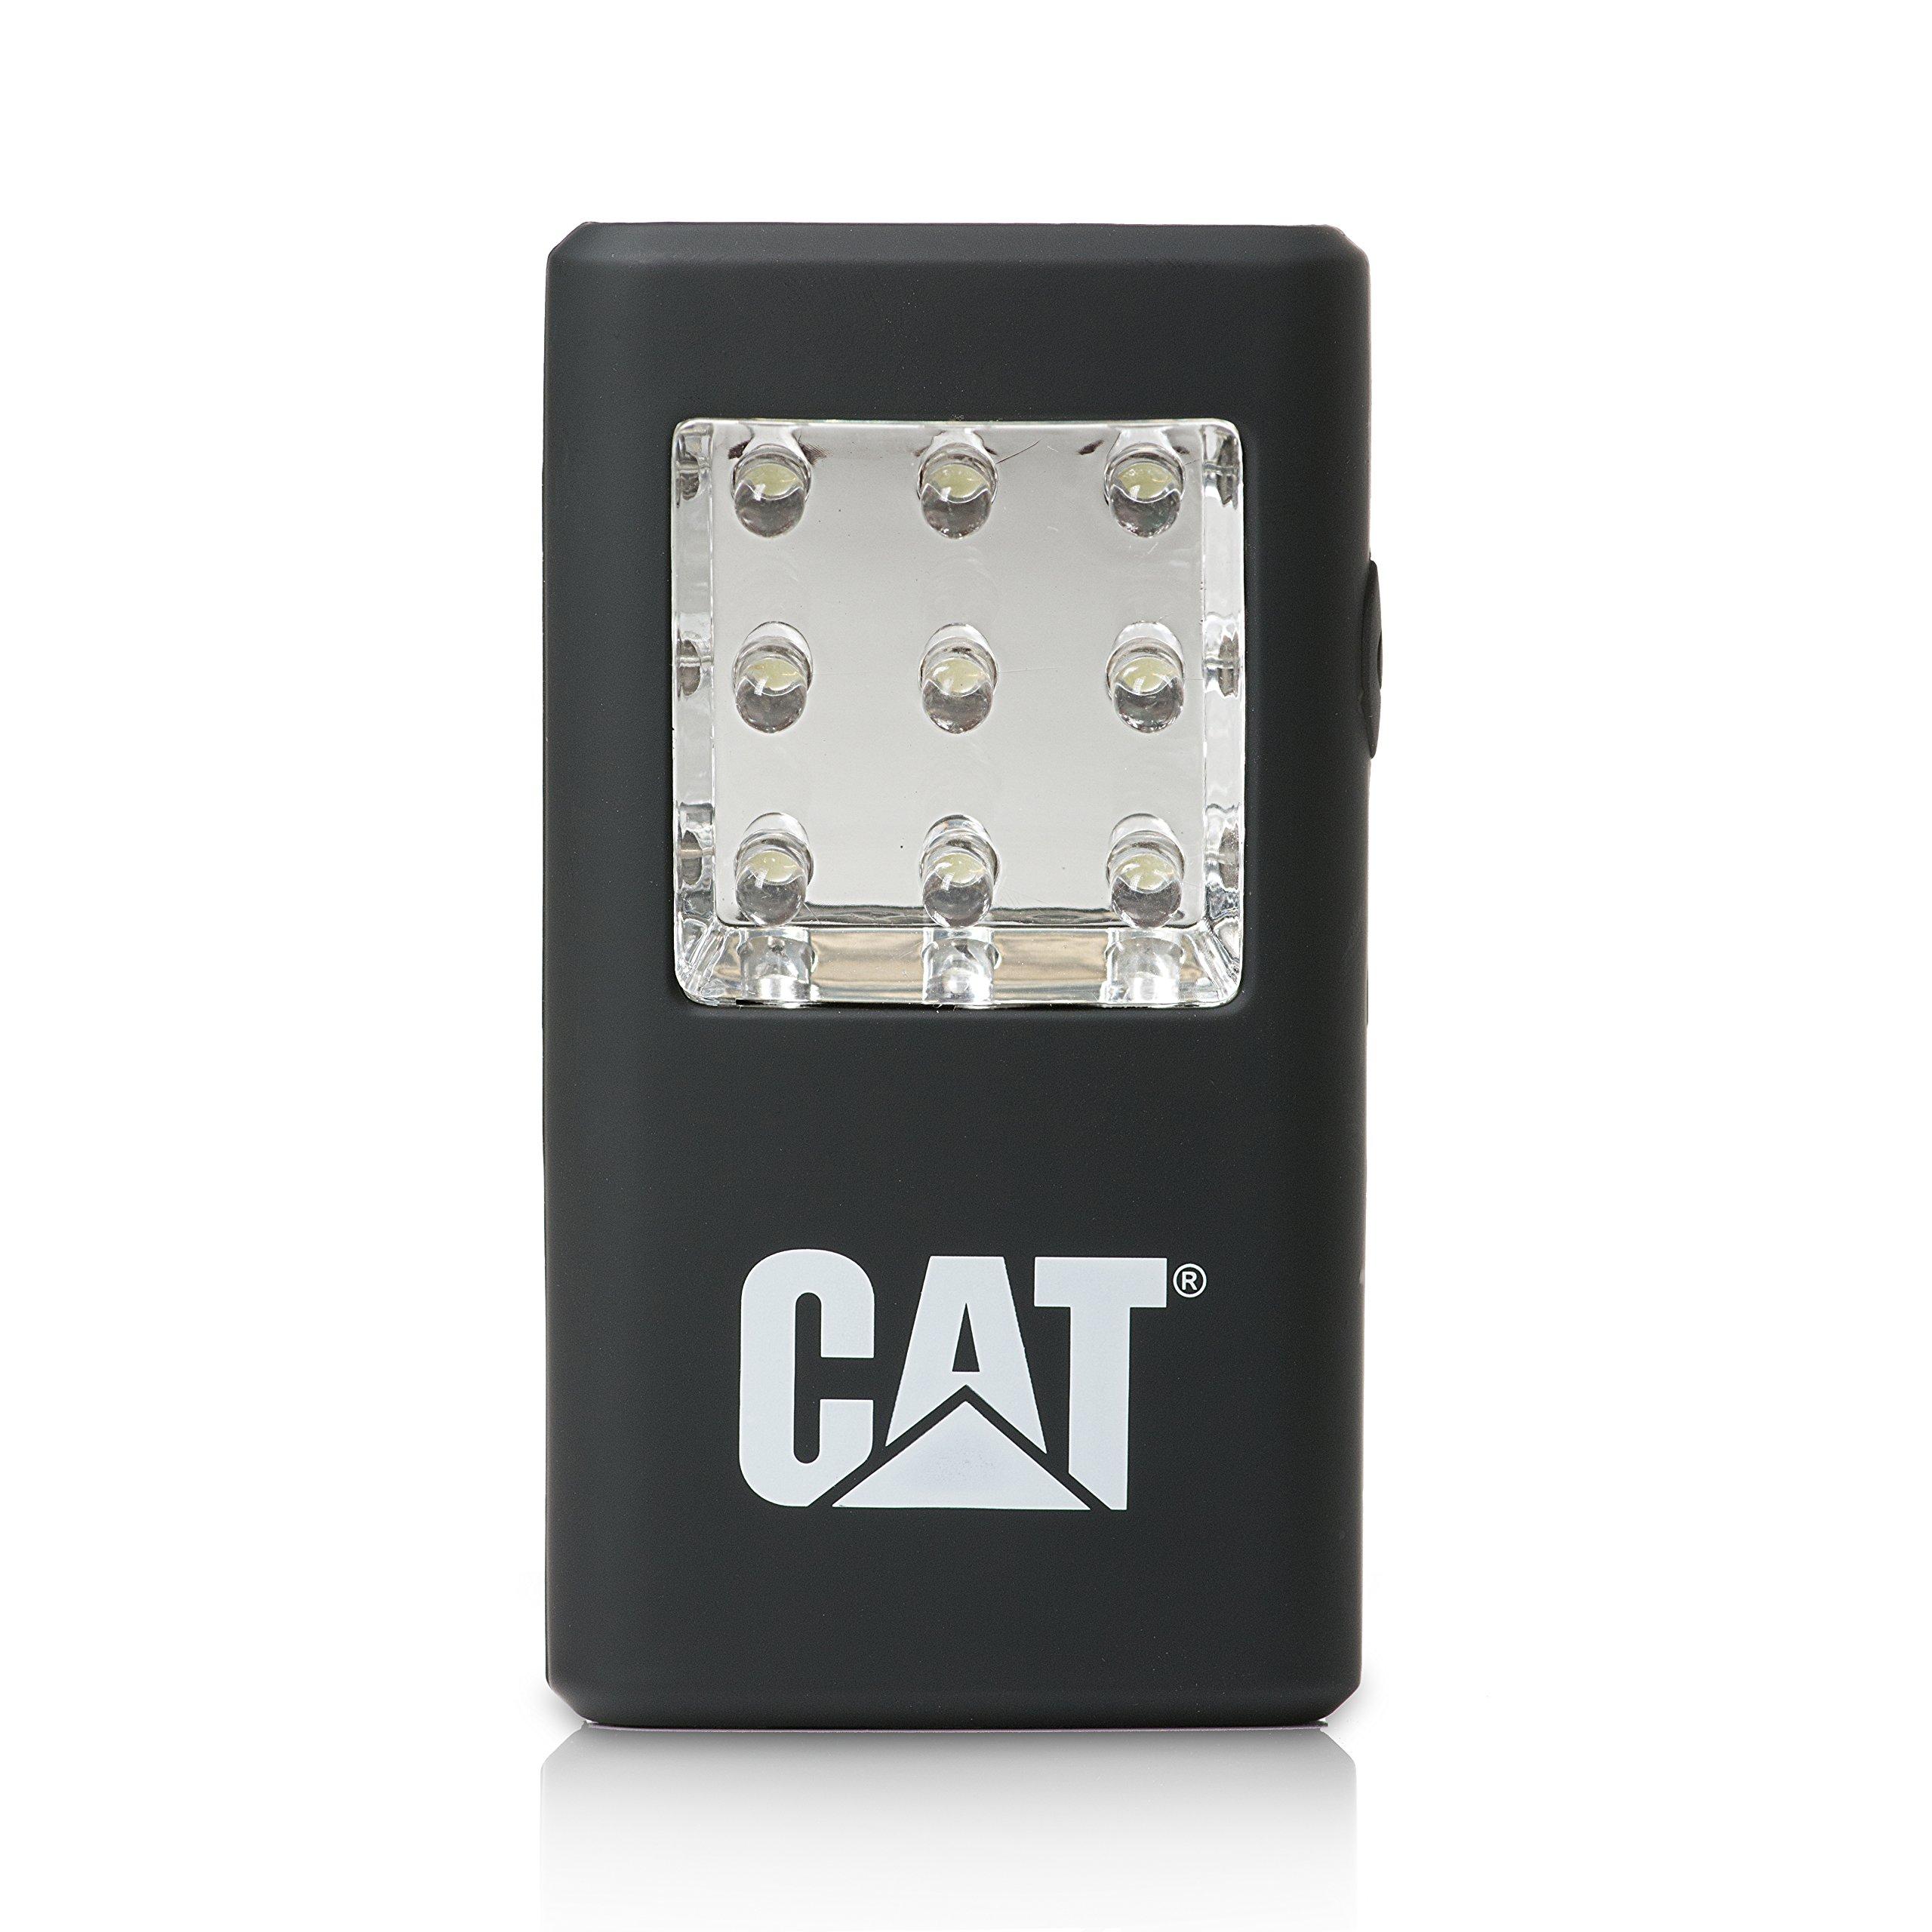 Cat CT50550 45/80 Lumen Dual  Pocket Light Features Two Separate Lighting Panels (Black) by Caterpillar